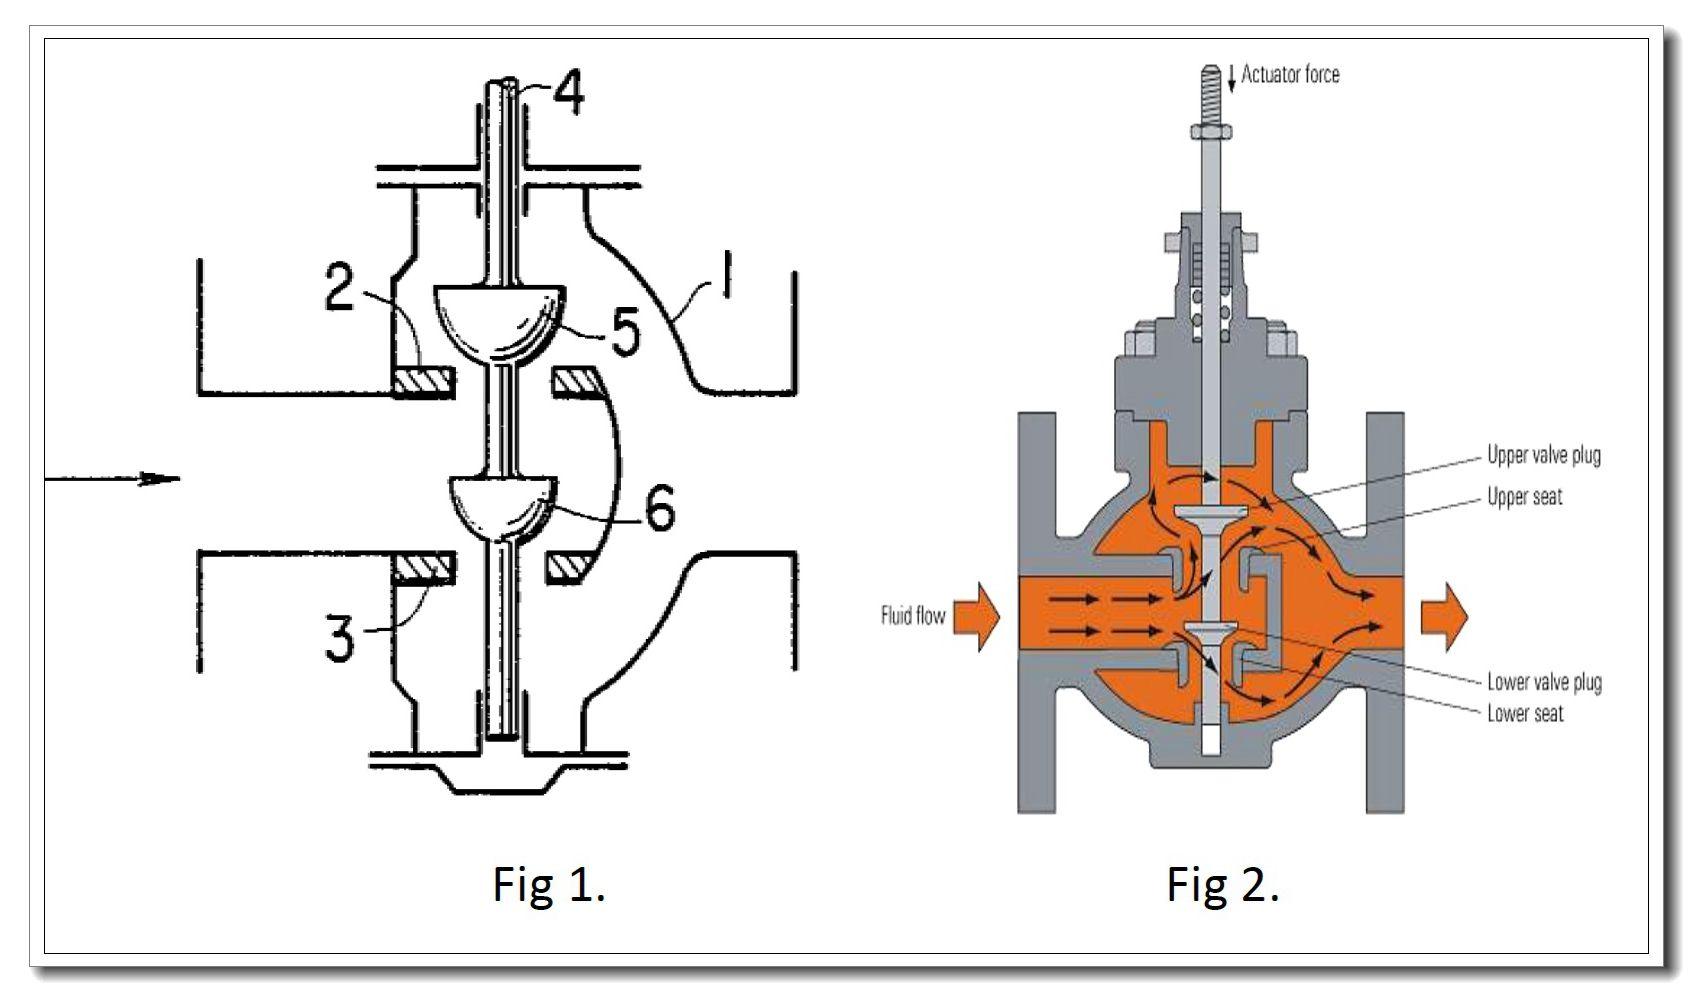 medium resolution of double valve diagram wiring diagram new double acting solenoid valve diagram double seat gate valve sjd susan